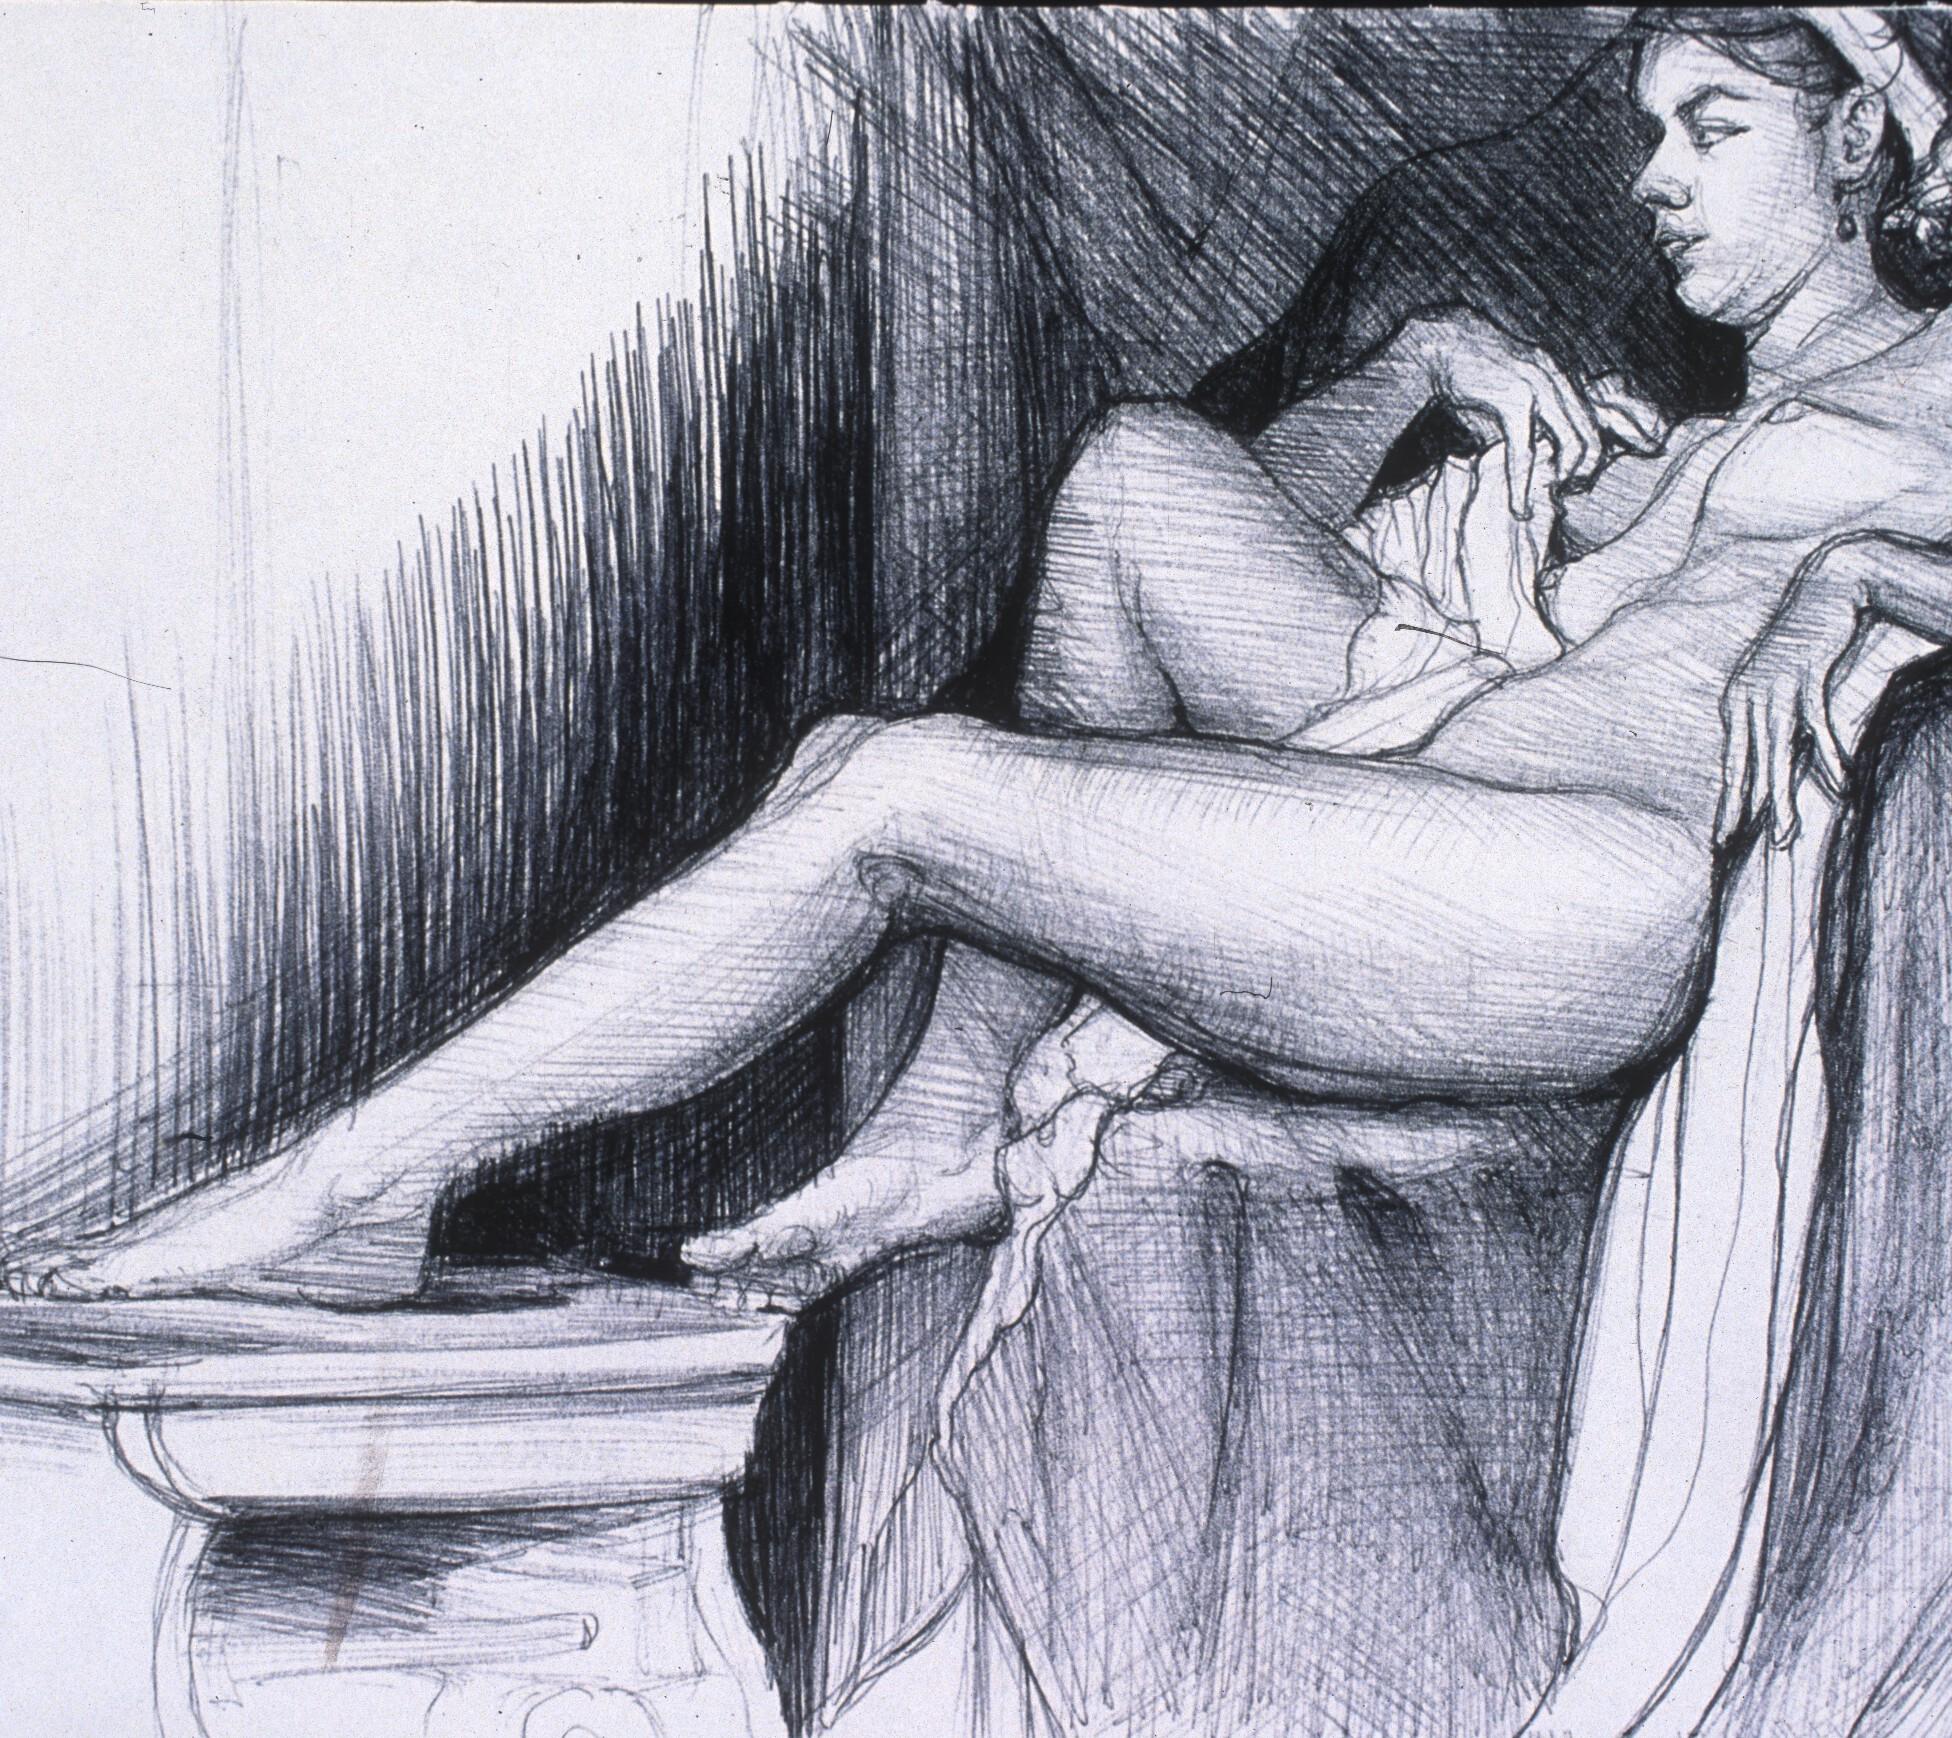 "Lou Ann Burkhardt  Robin Reclining  , 2001 Pen and ink on paper 13-1/2"" x 16-1/2"" framed"